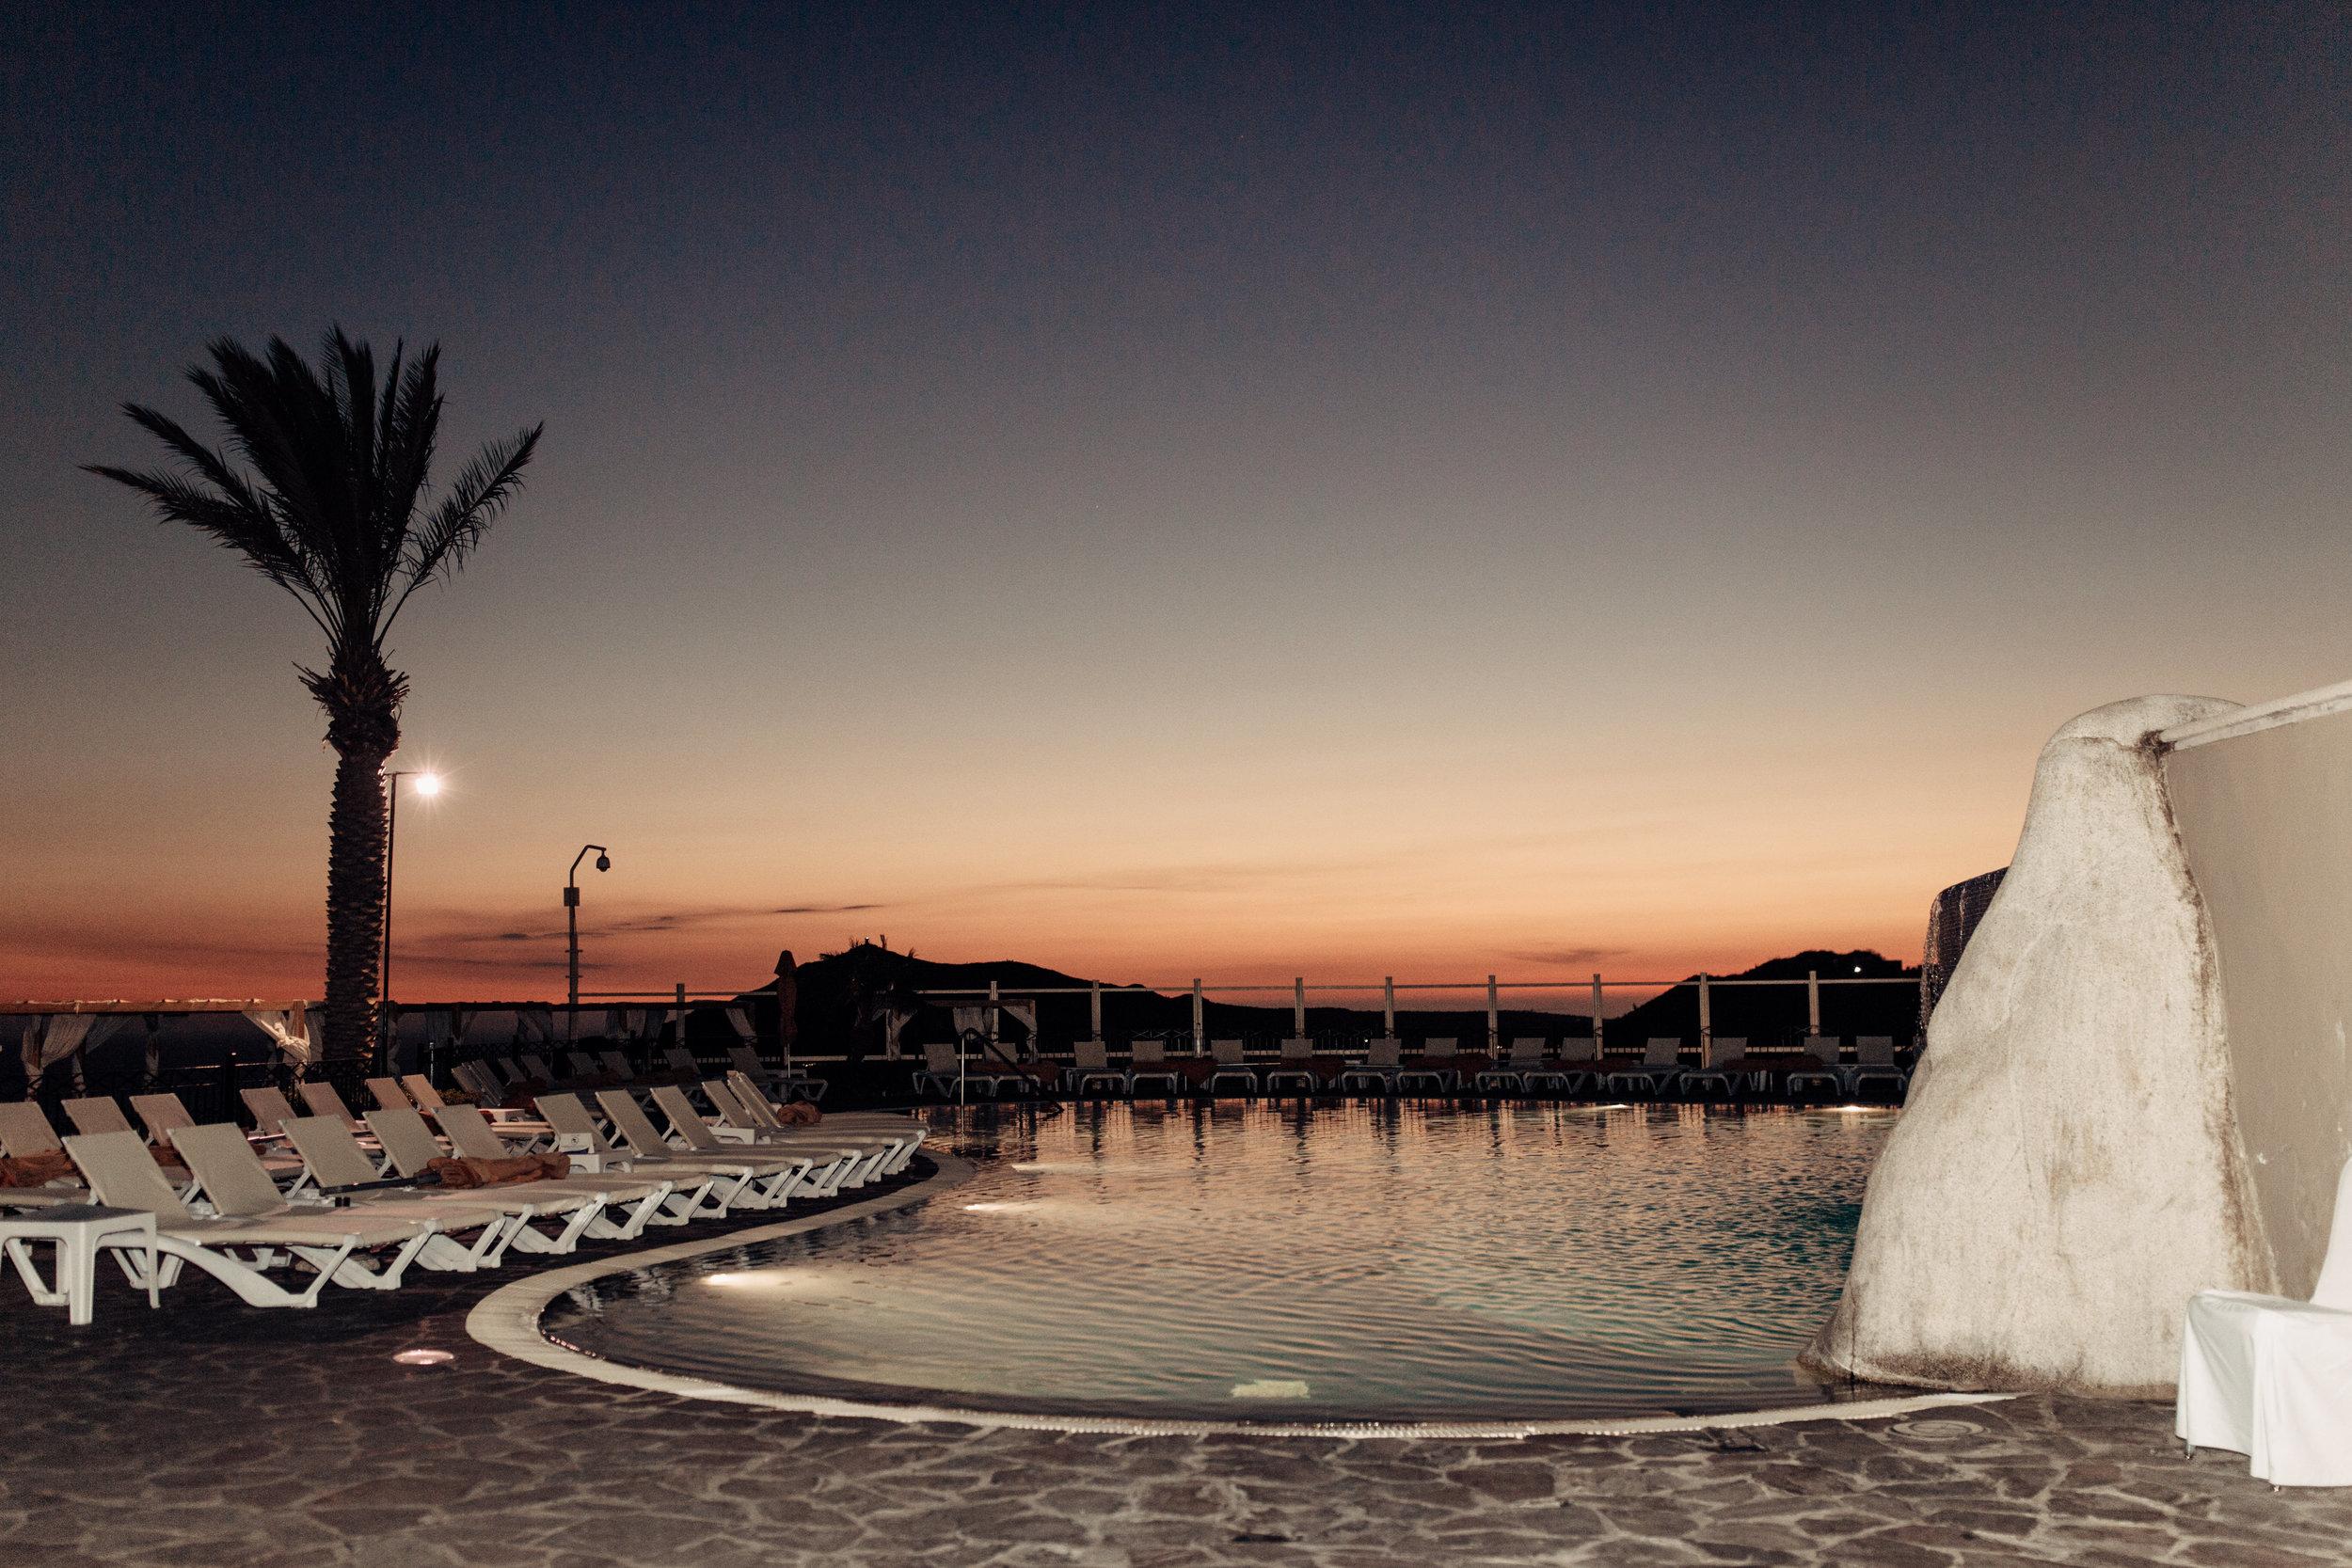 pueblo-bonito-sunset-beach-wedding-cabo-san-lucas645.jpg